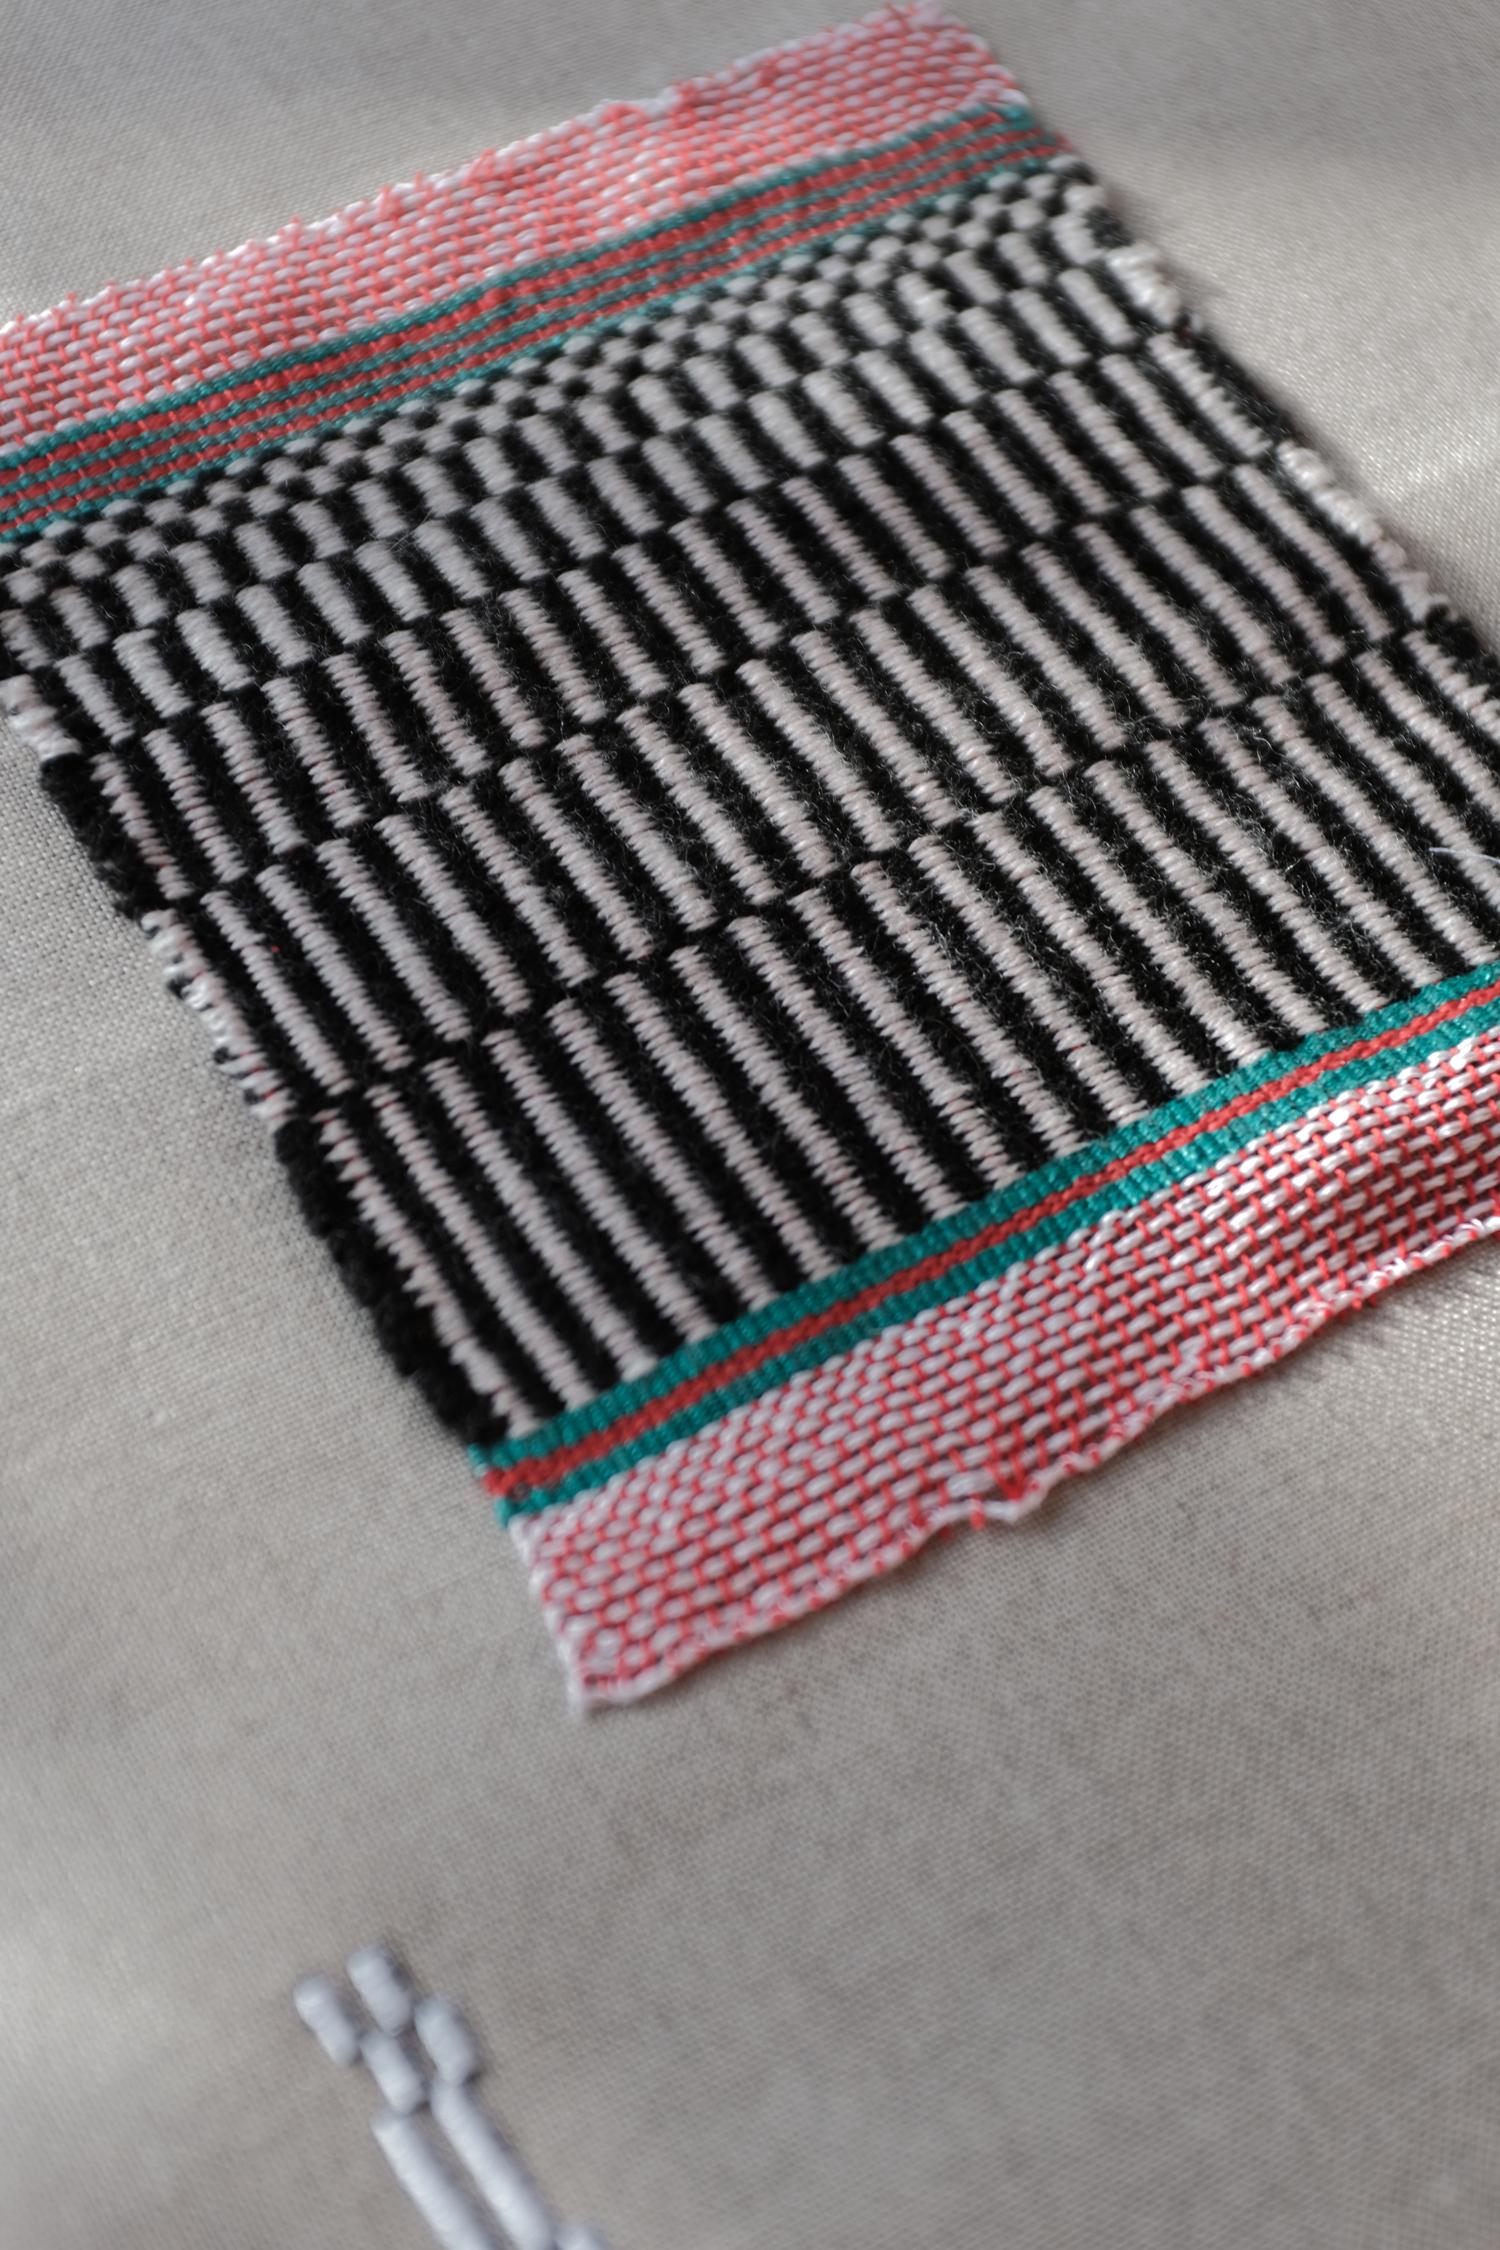 Baja Weaving series – Over The Border